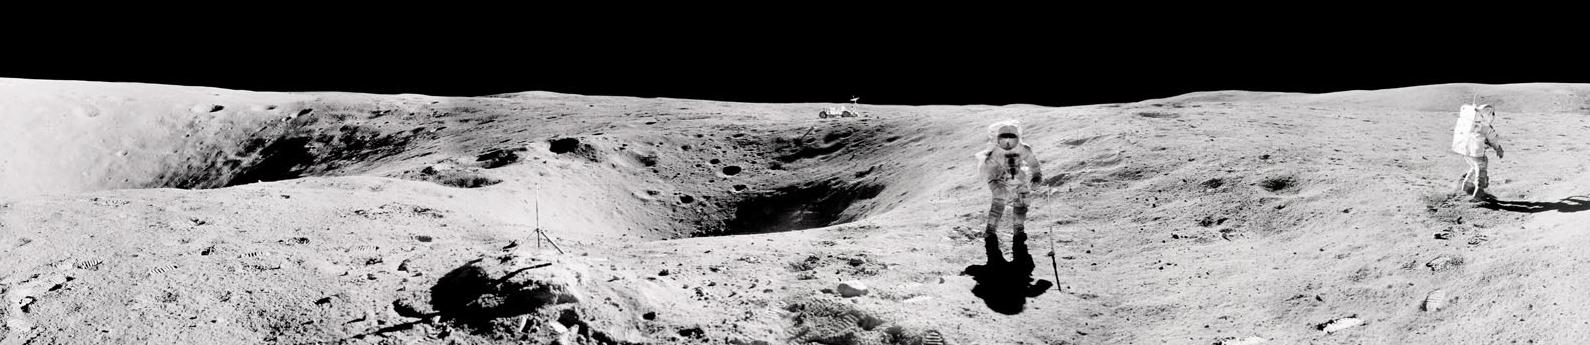 Lunar Rover Panorama (Image)